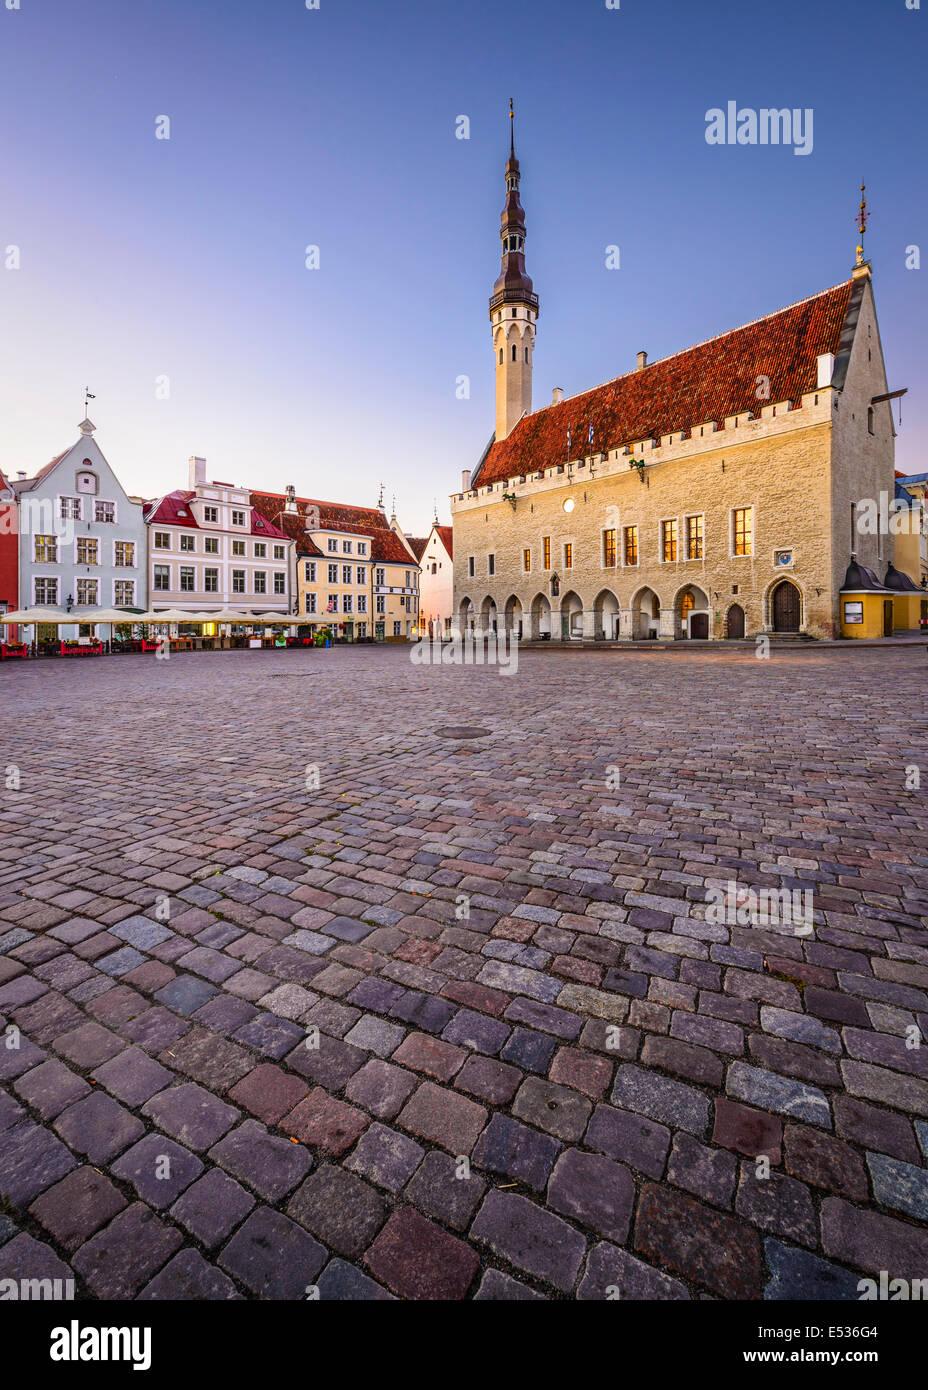 Tallinn, Estonia at the Old Town Hall Square. - Stock Image